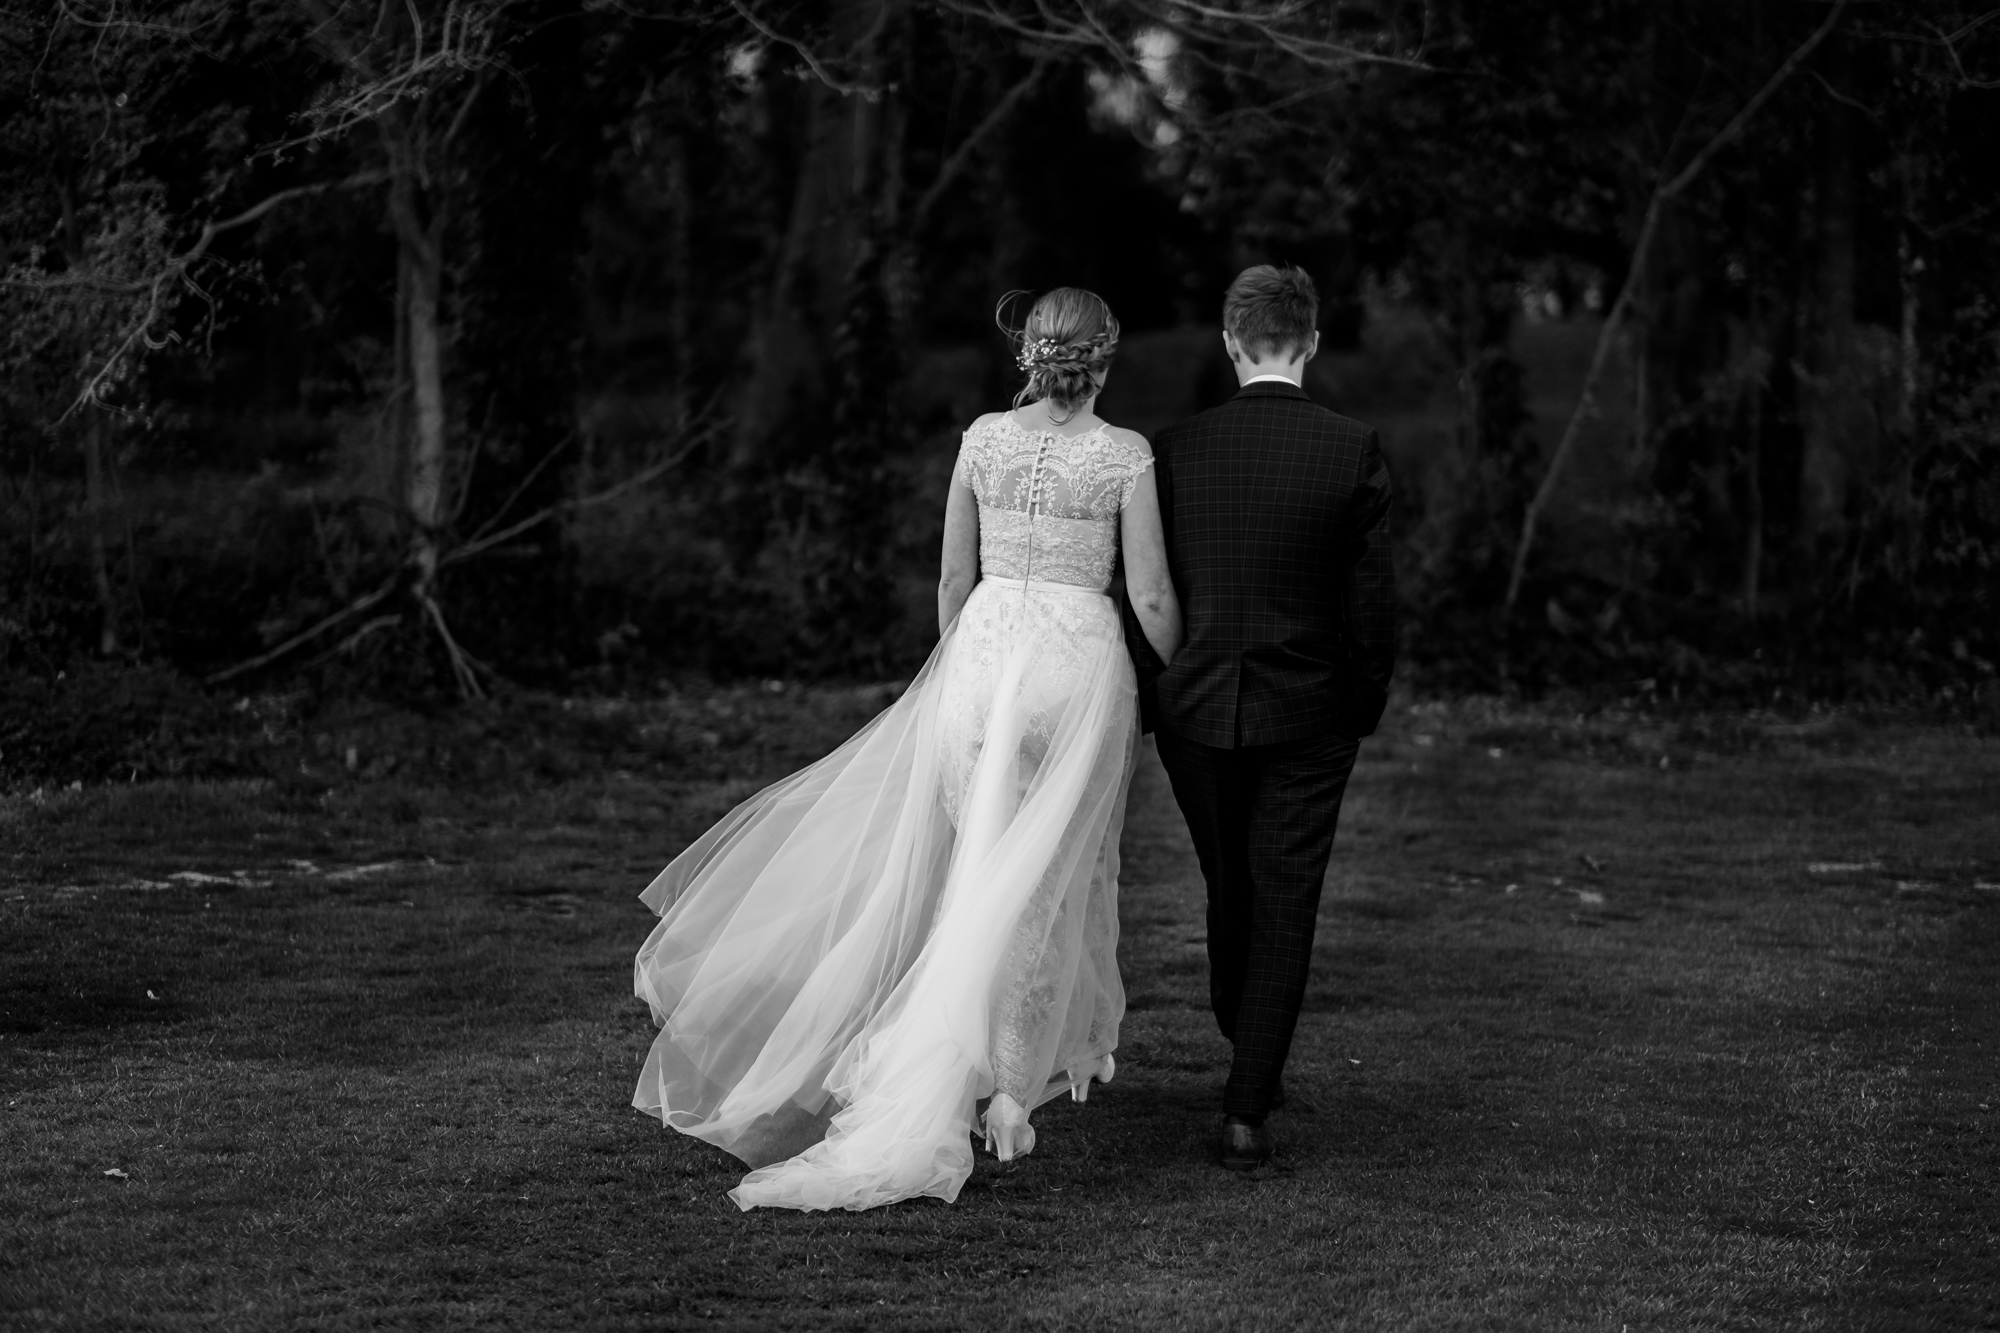 Katie and Dode weddings (177 of 207).jpg